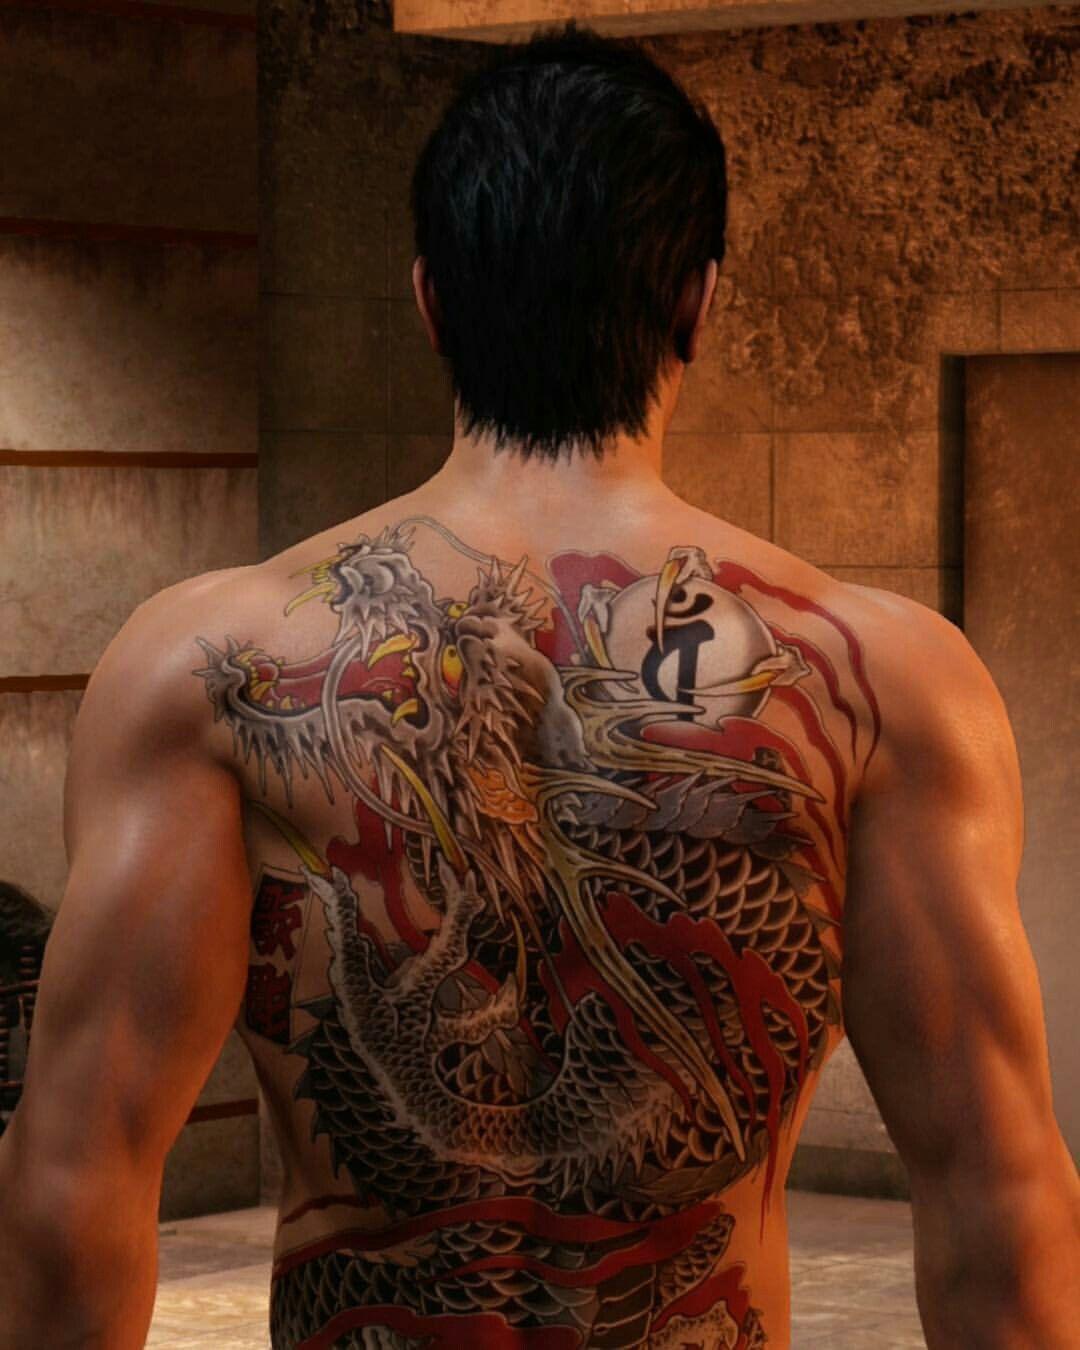 Kiryu Kazuma Tattoo: Vücuda Uyumlu Dövmeler, Japonca Dövmeler